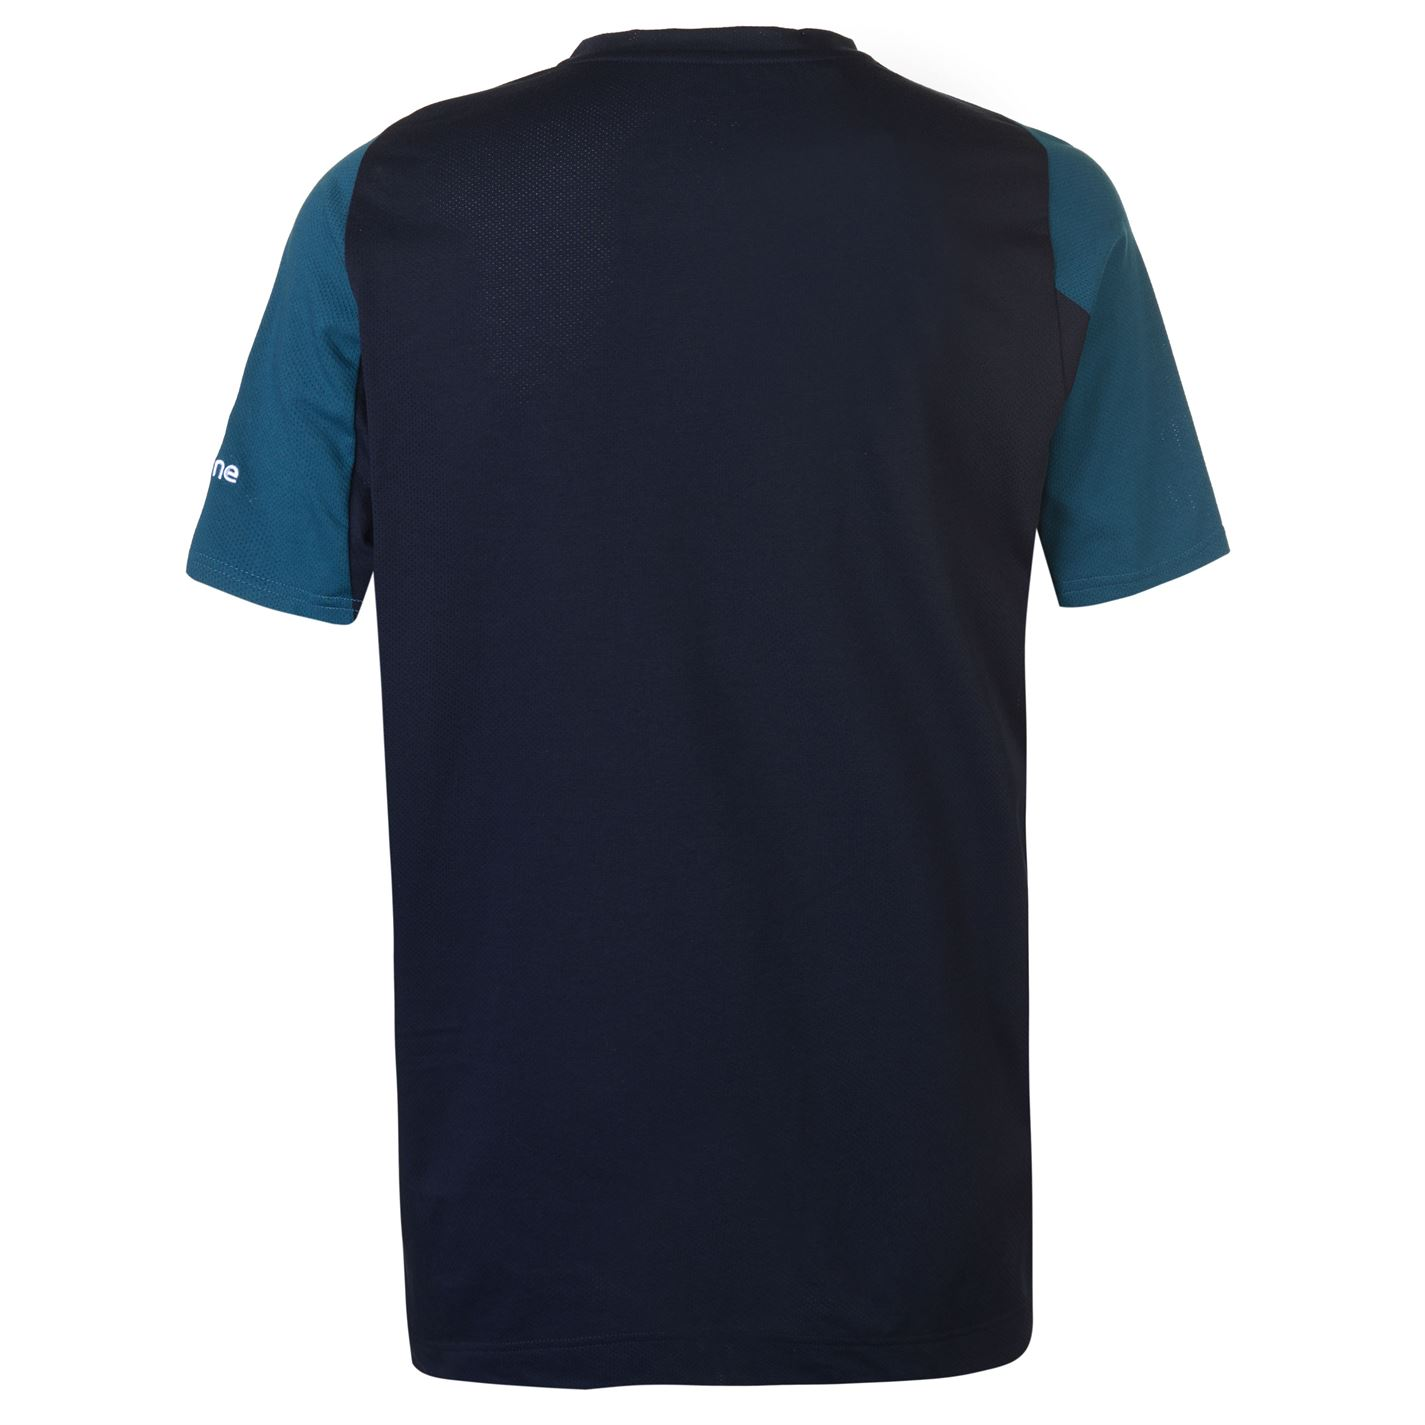 Canterbury Ireland Sport Activity Top Mens Gents Shirt Short Sleeve Round Neck